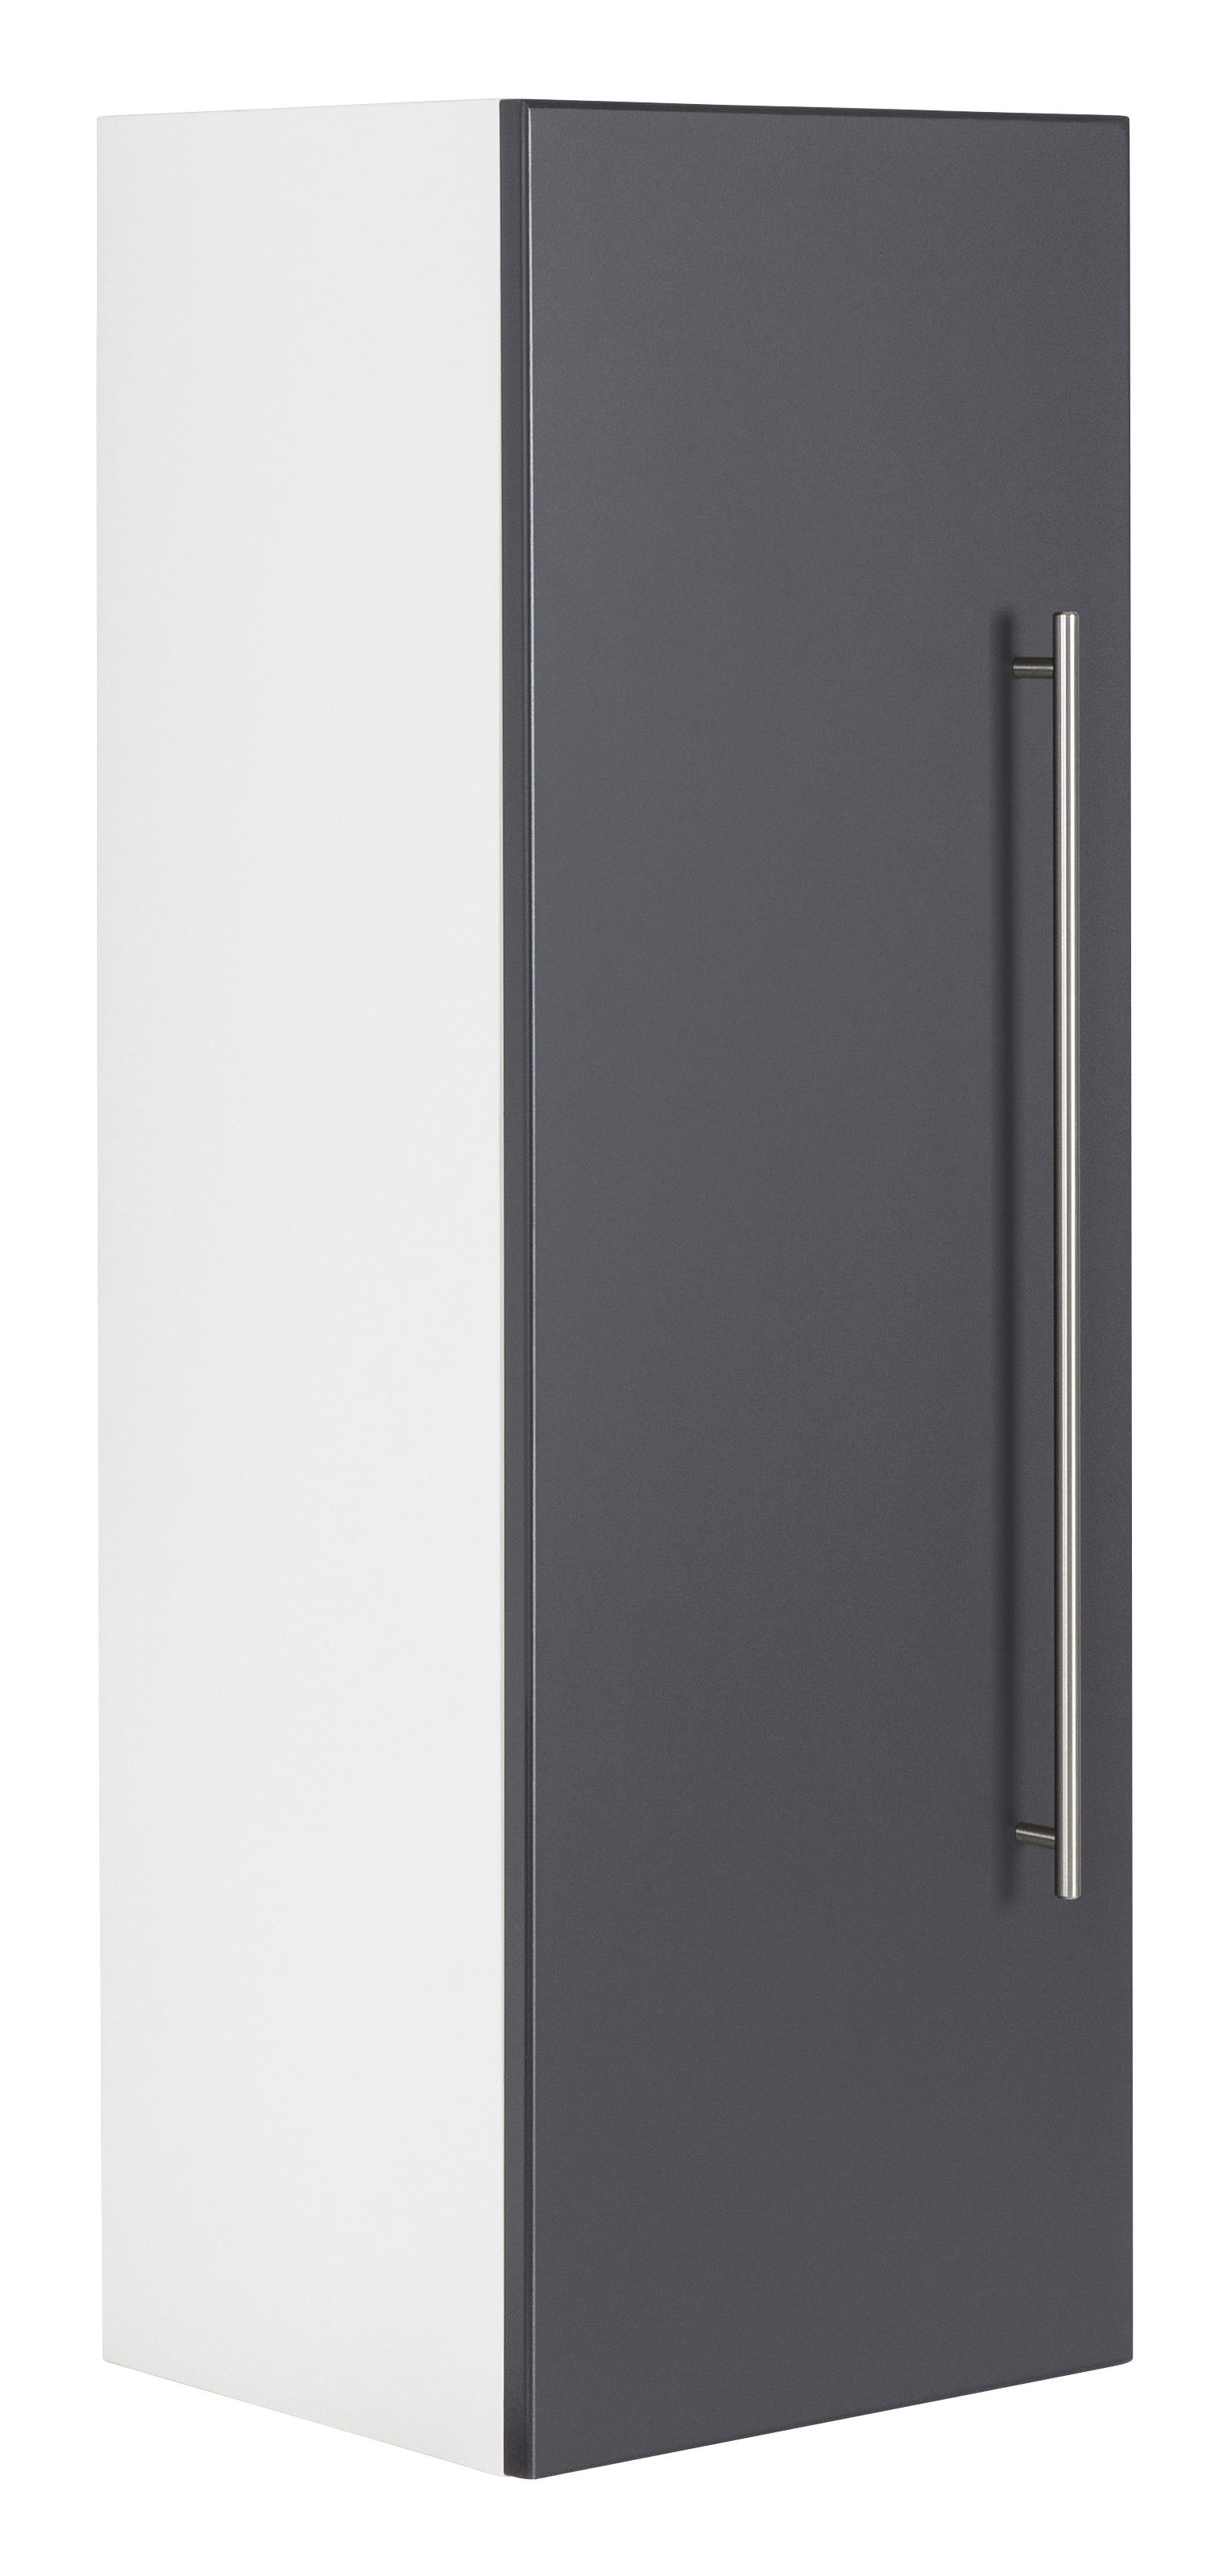 Saniclear Viva kolomkast 100x35x30cm antraciet